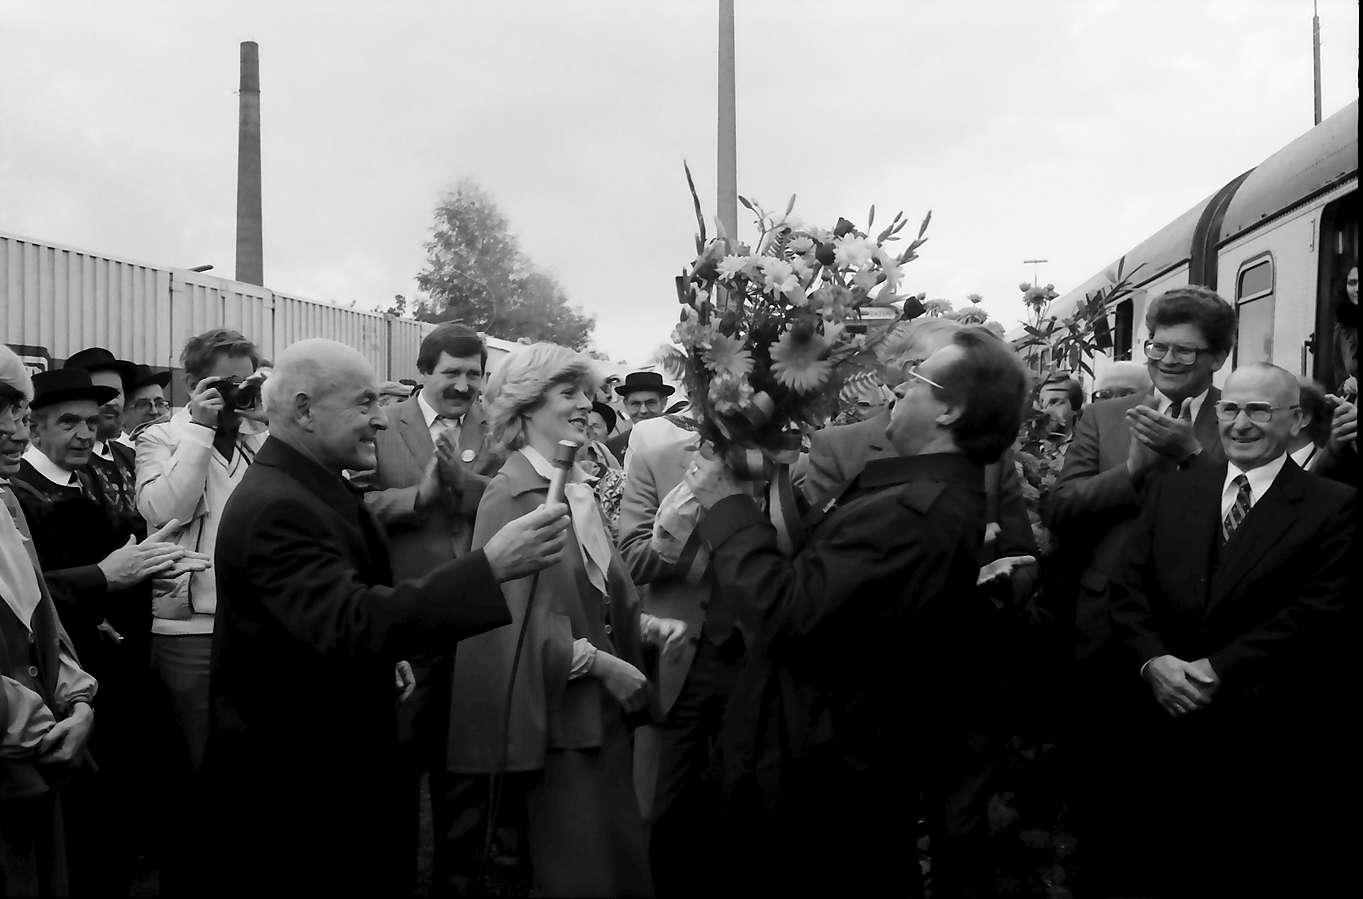 Rheinfelden: Begrüßung, Bild 1